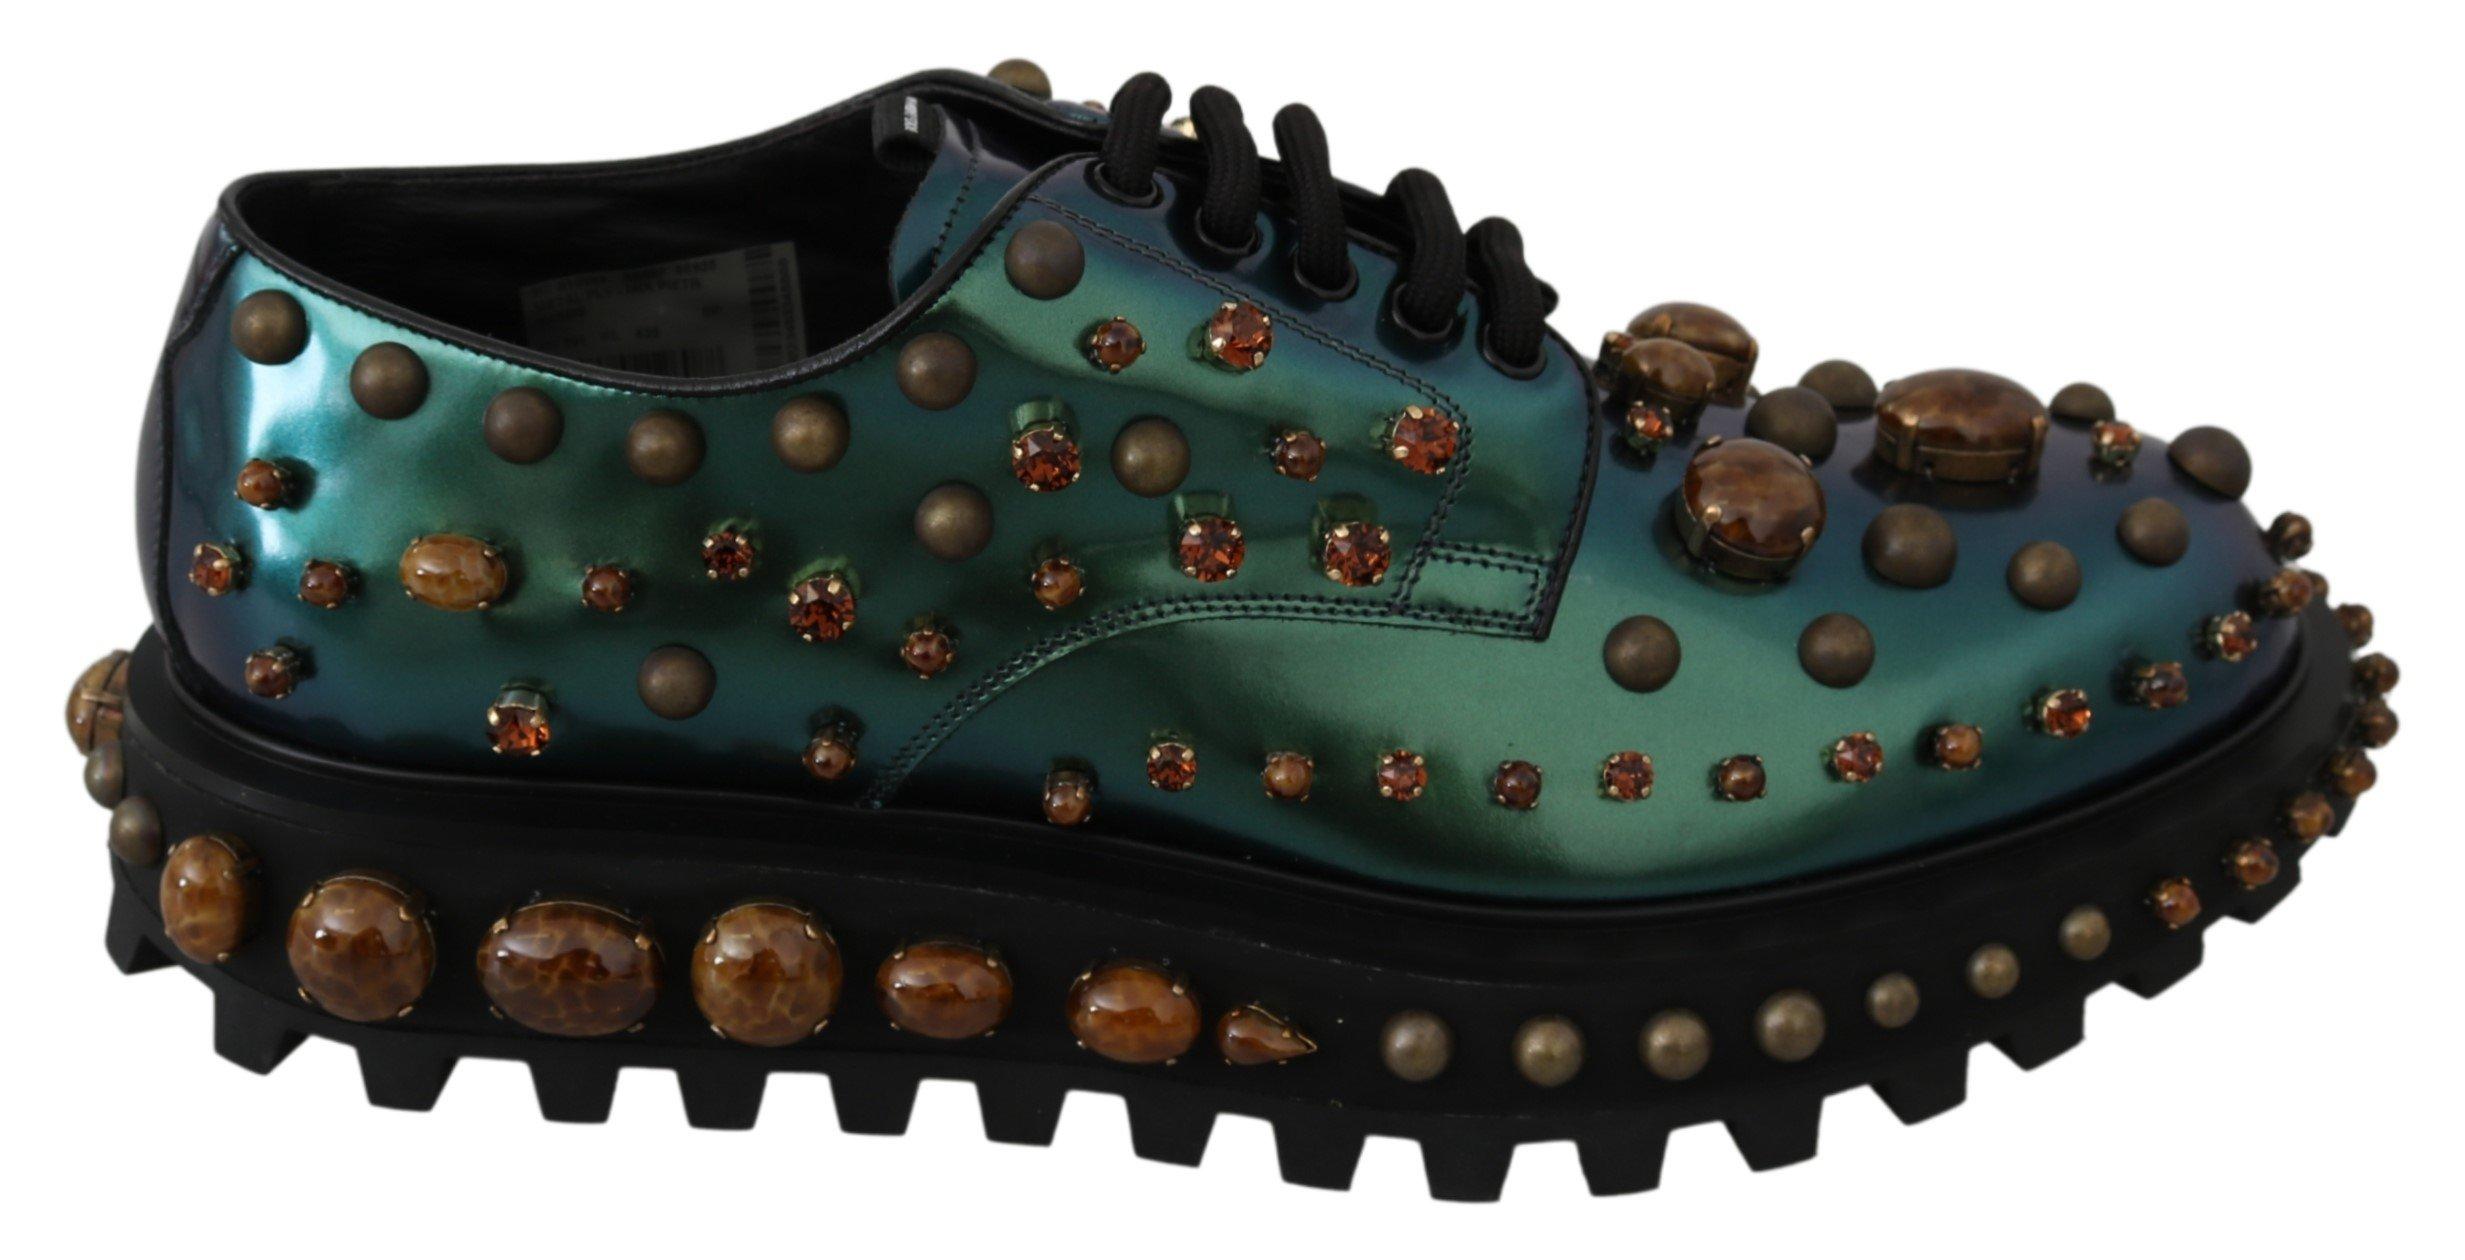 Dolce & Gabbana Men's Shiny Leather Crystals Derby Shoe Green MV3010 - EU43/US10